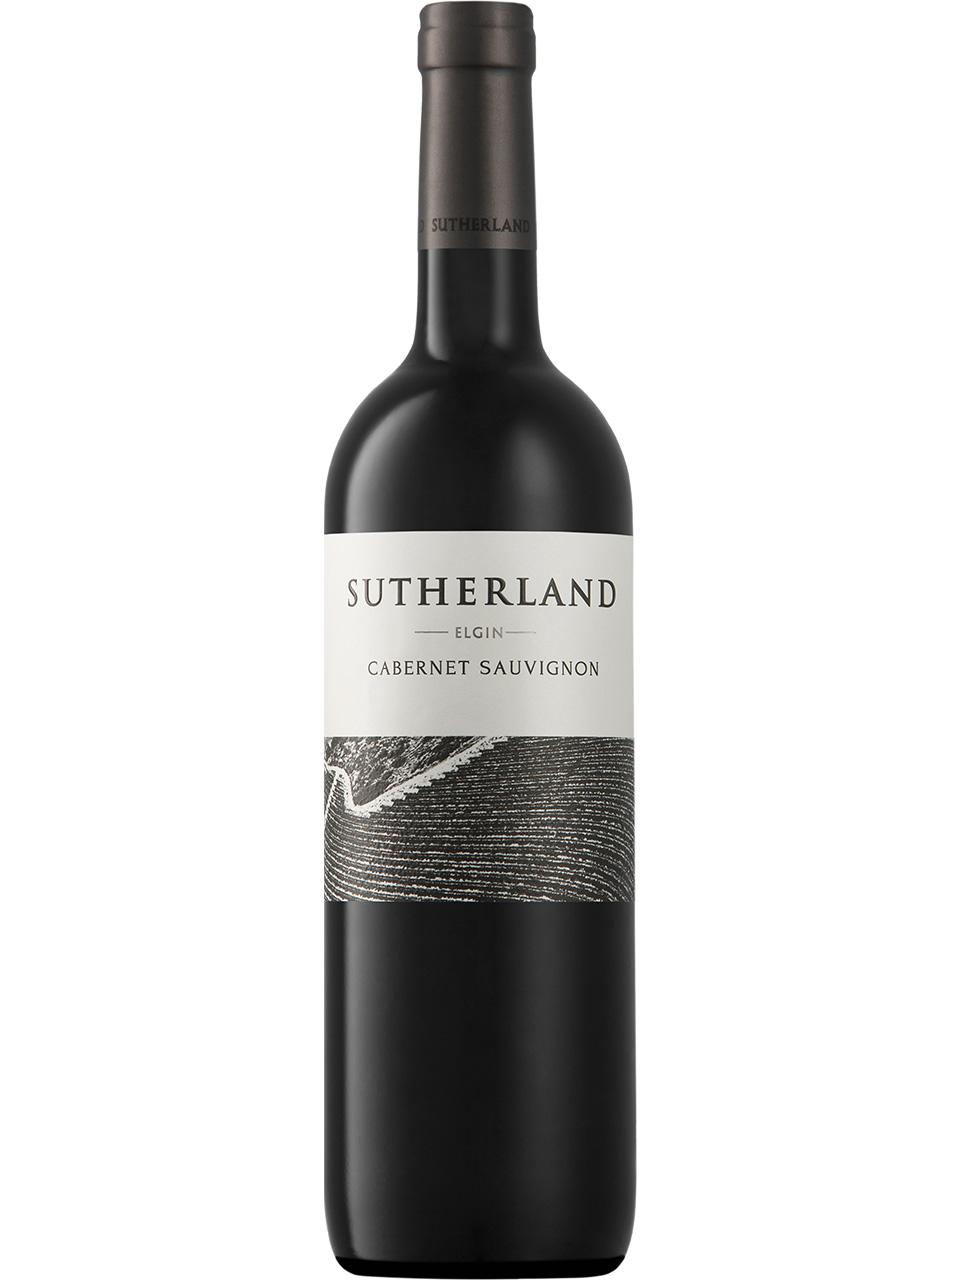 Sutherland Cabernet Sauvignon